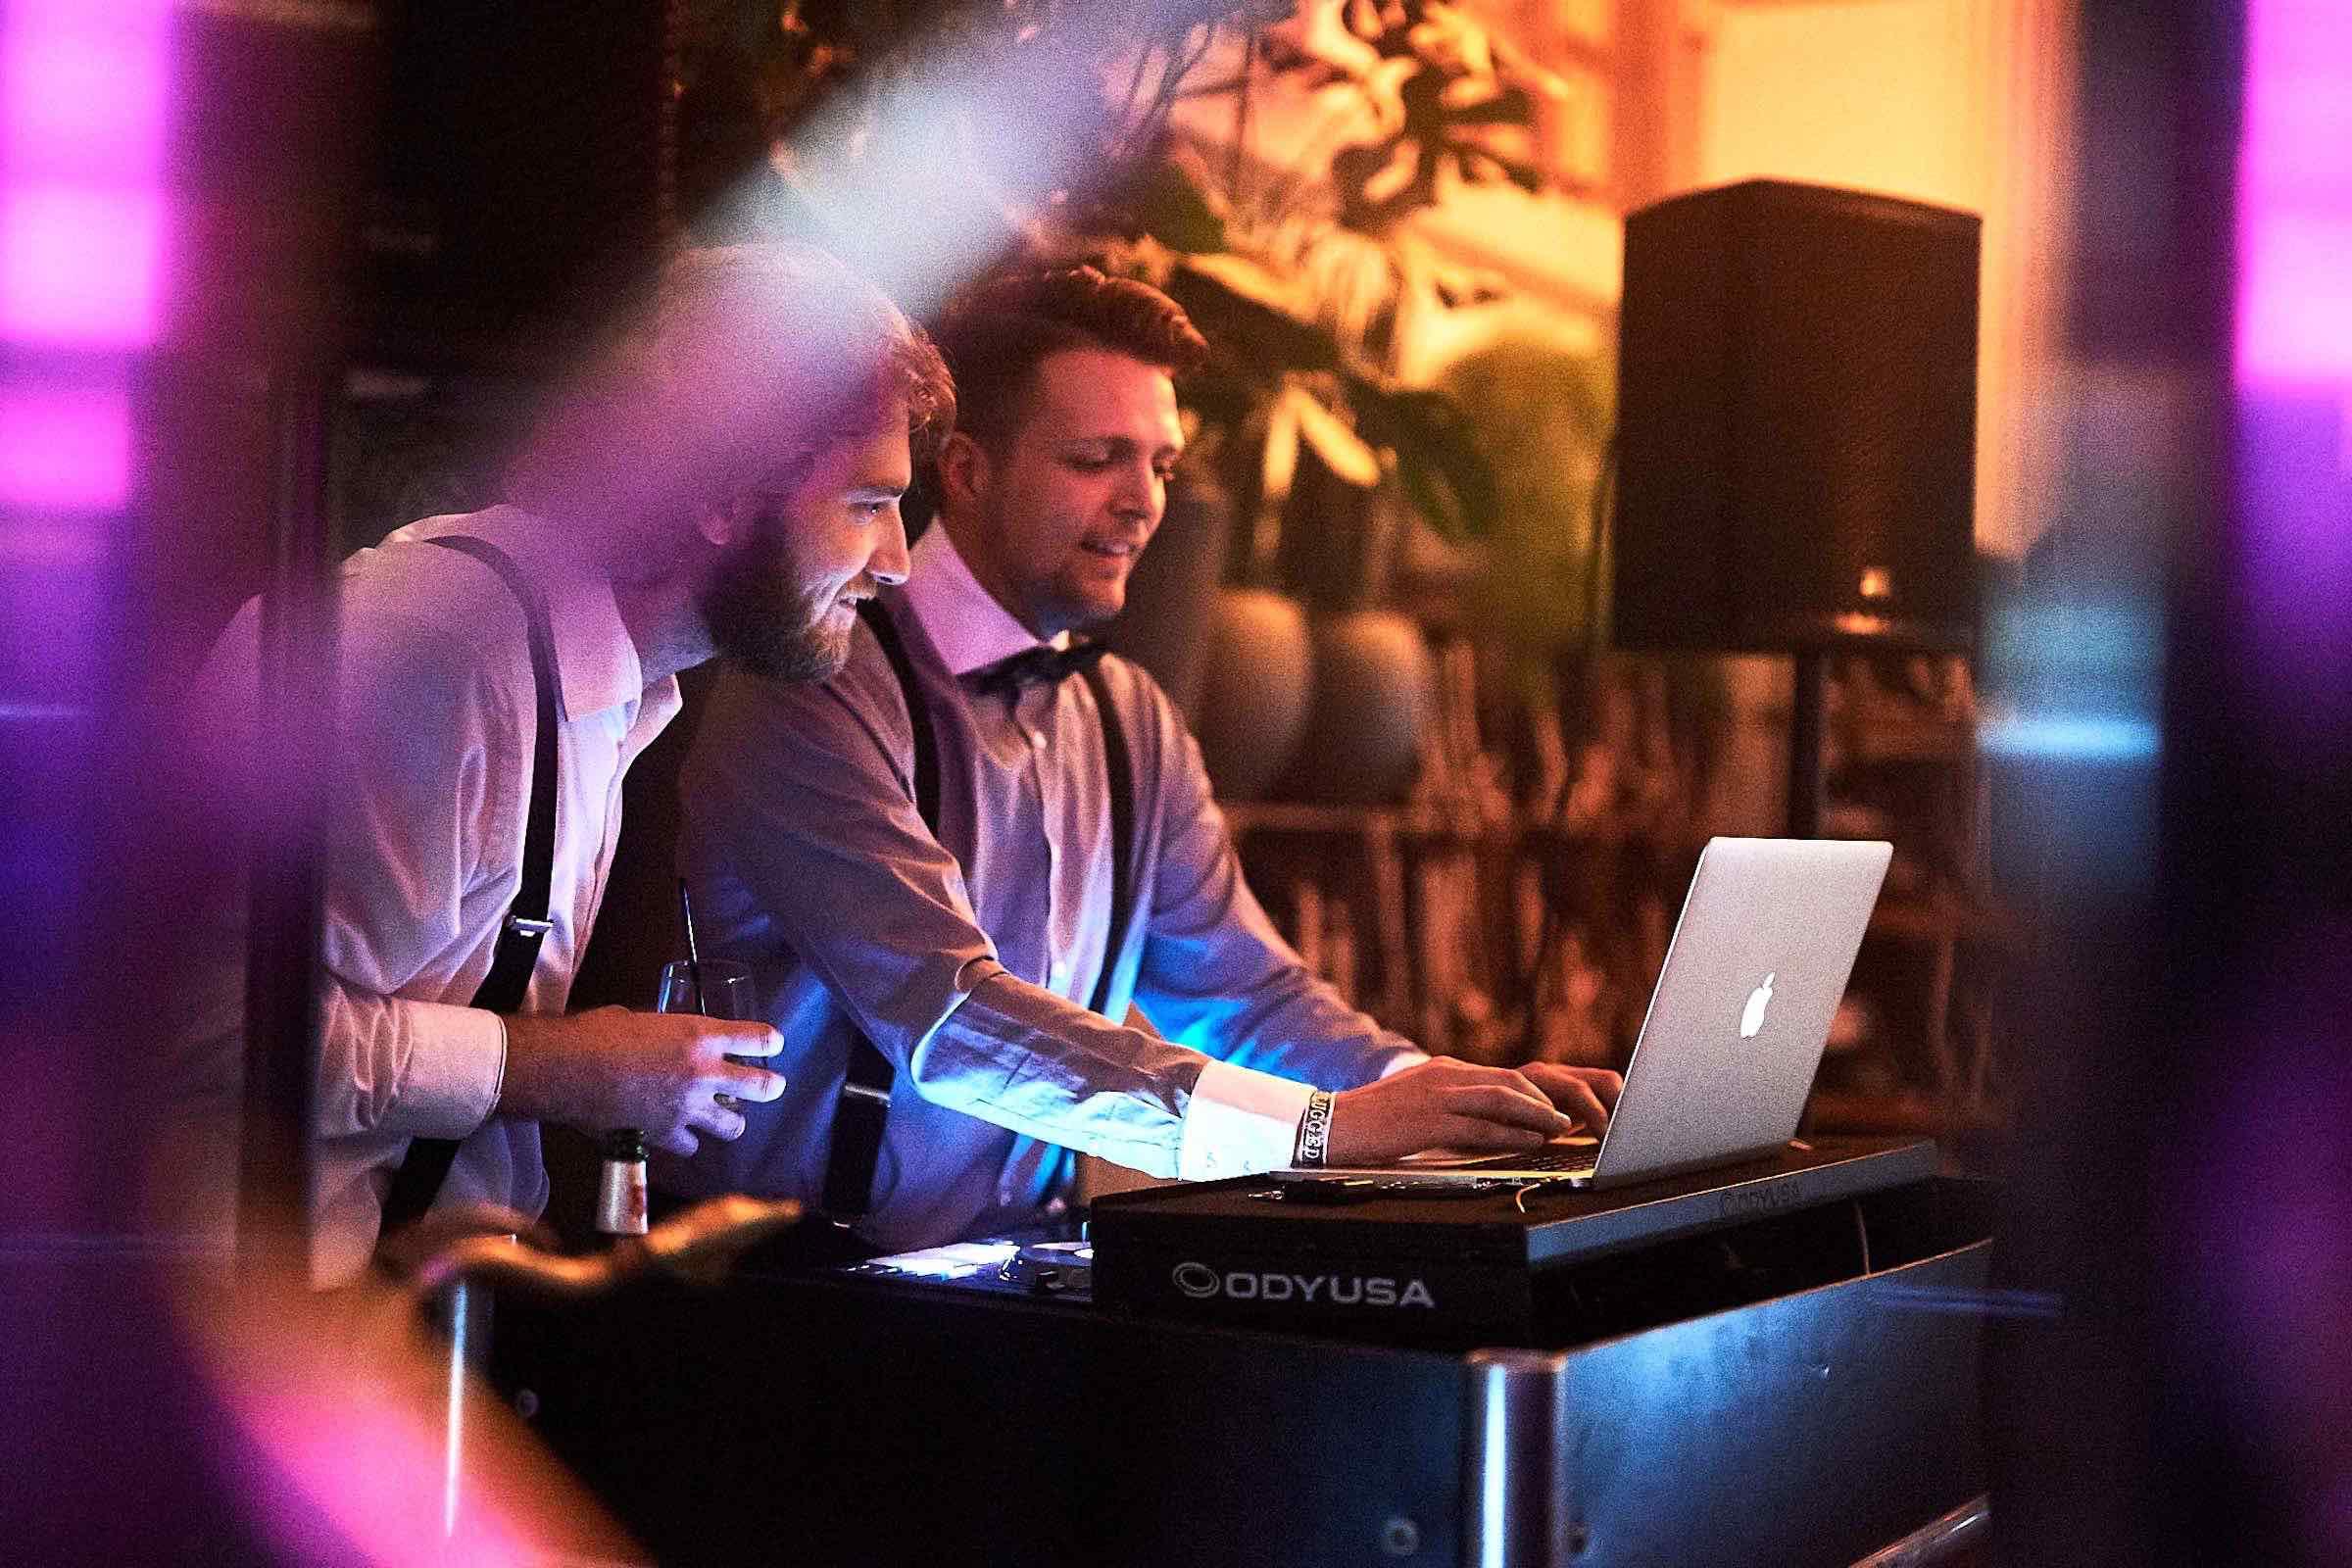 DJ | Hamburg | Hochzeit | Timm | Lehmann | DJ | Firmenfeier | Event | DJ | Geburtstag | Buchen | DJ | Hamburg | Discjockey | Mieten | Anfragen | Musikwünsche | Hamburgfeiert